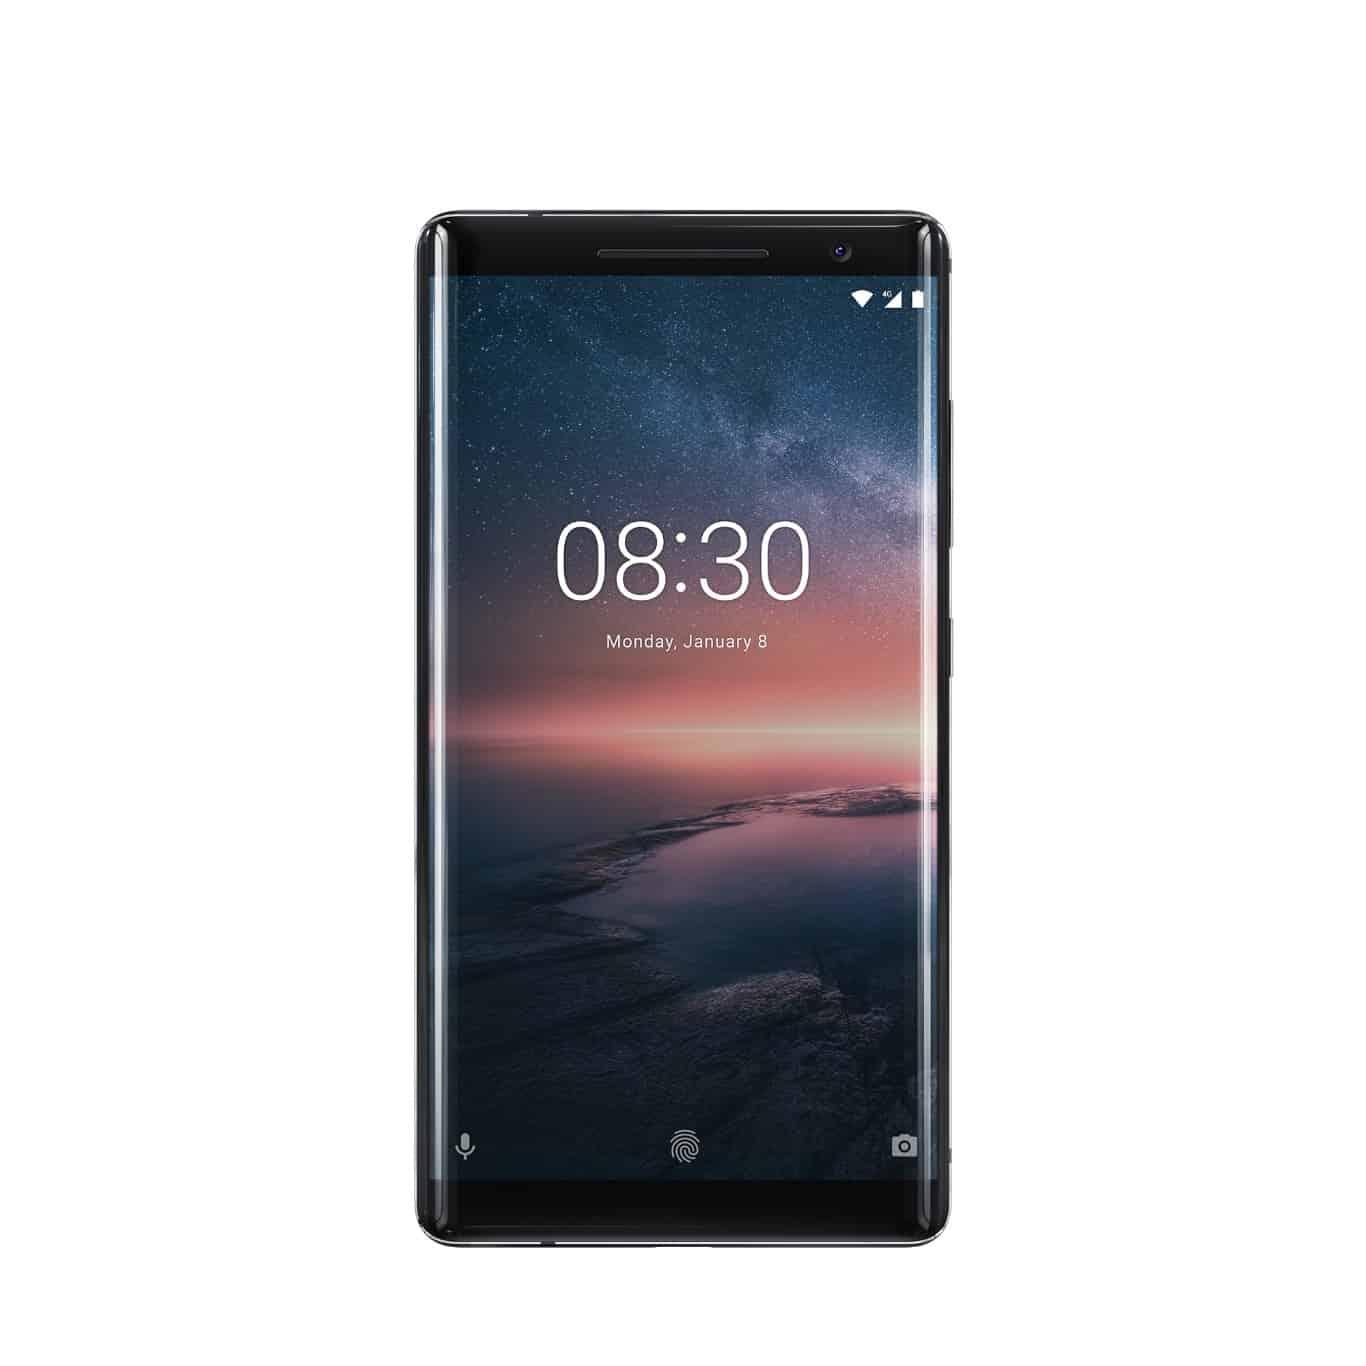 Nokia 8 Sirocco image 5